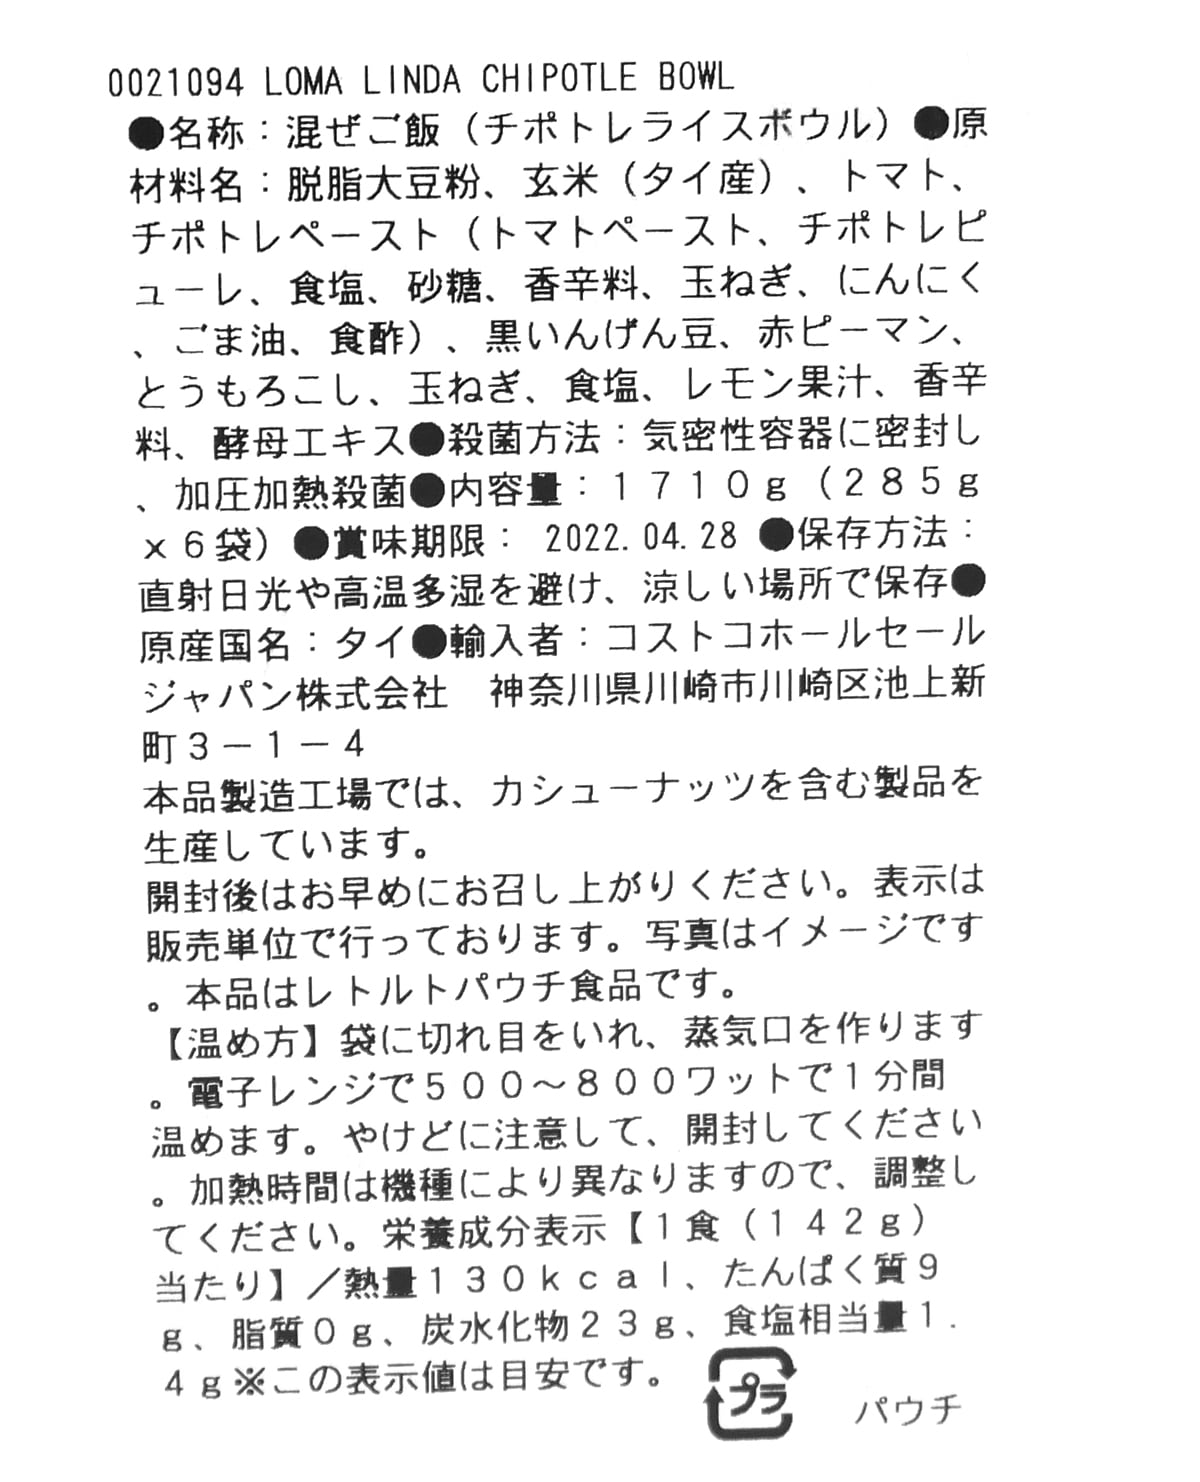 LOMA LINDA チポトレボウル レトルトライスボウル 6パック 裏面ラベル(原材料・カロリーほか)